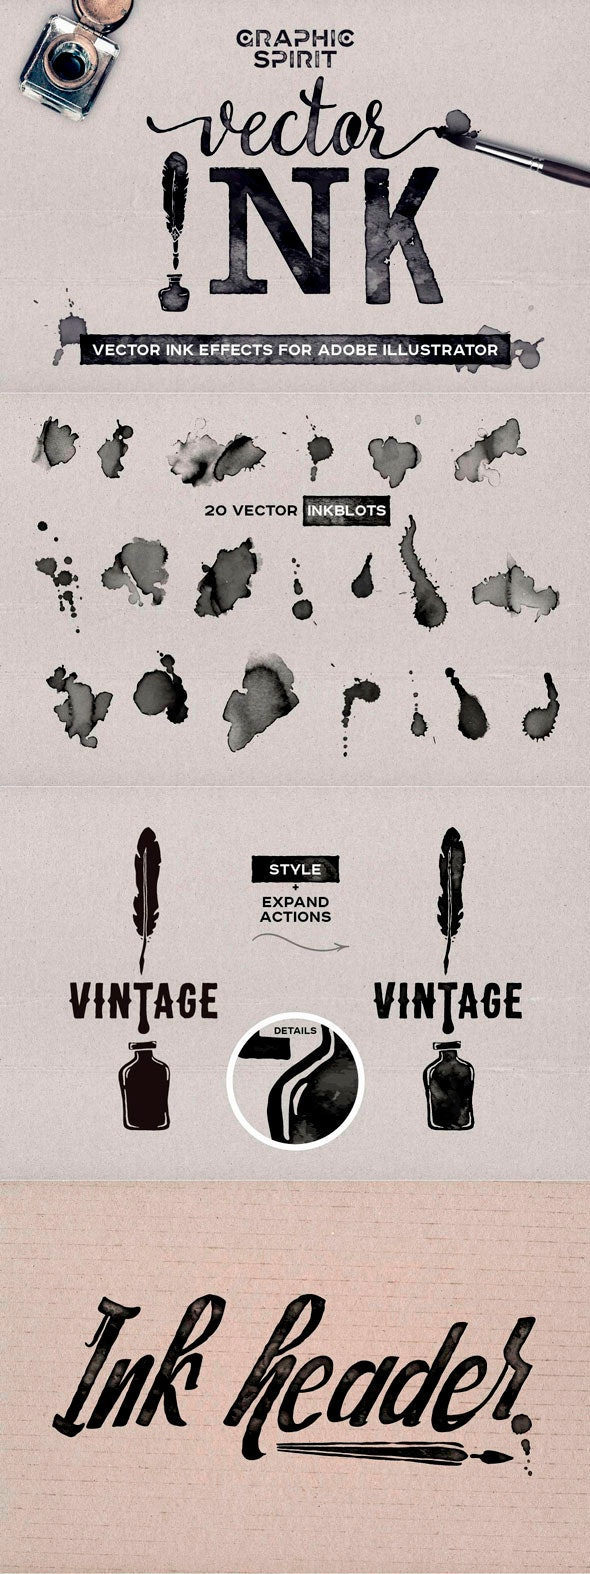 Vector Ink Effects For Adobe Illustrator - Illustrator Add-ons